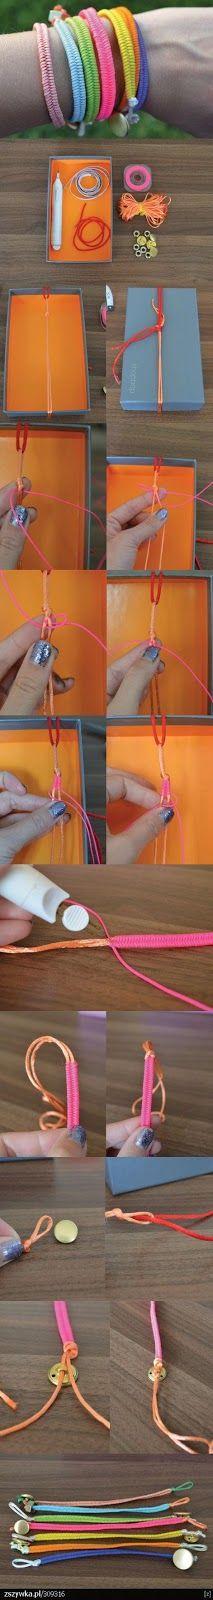 DIY Braided Bracelets #macrame #bracelets #friendshipbracelets #accessories #jewelry